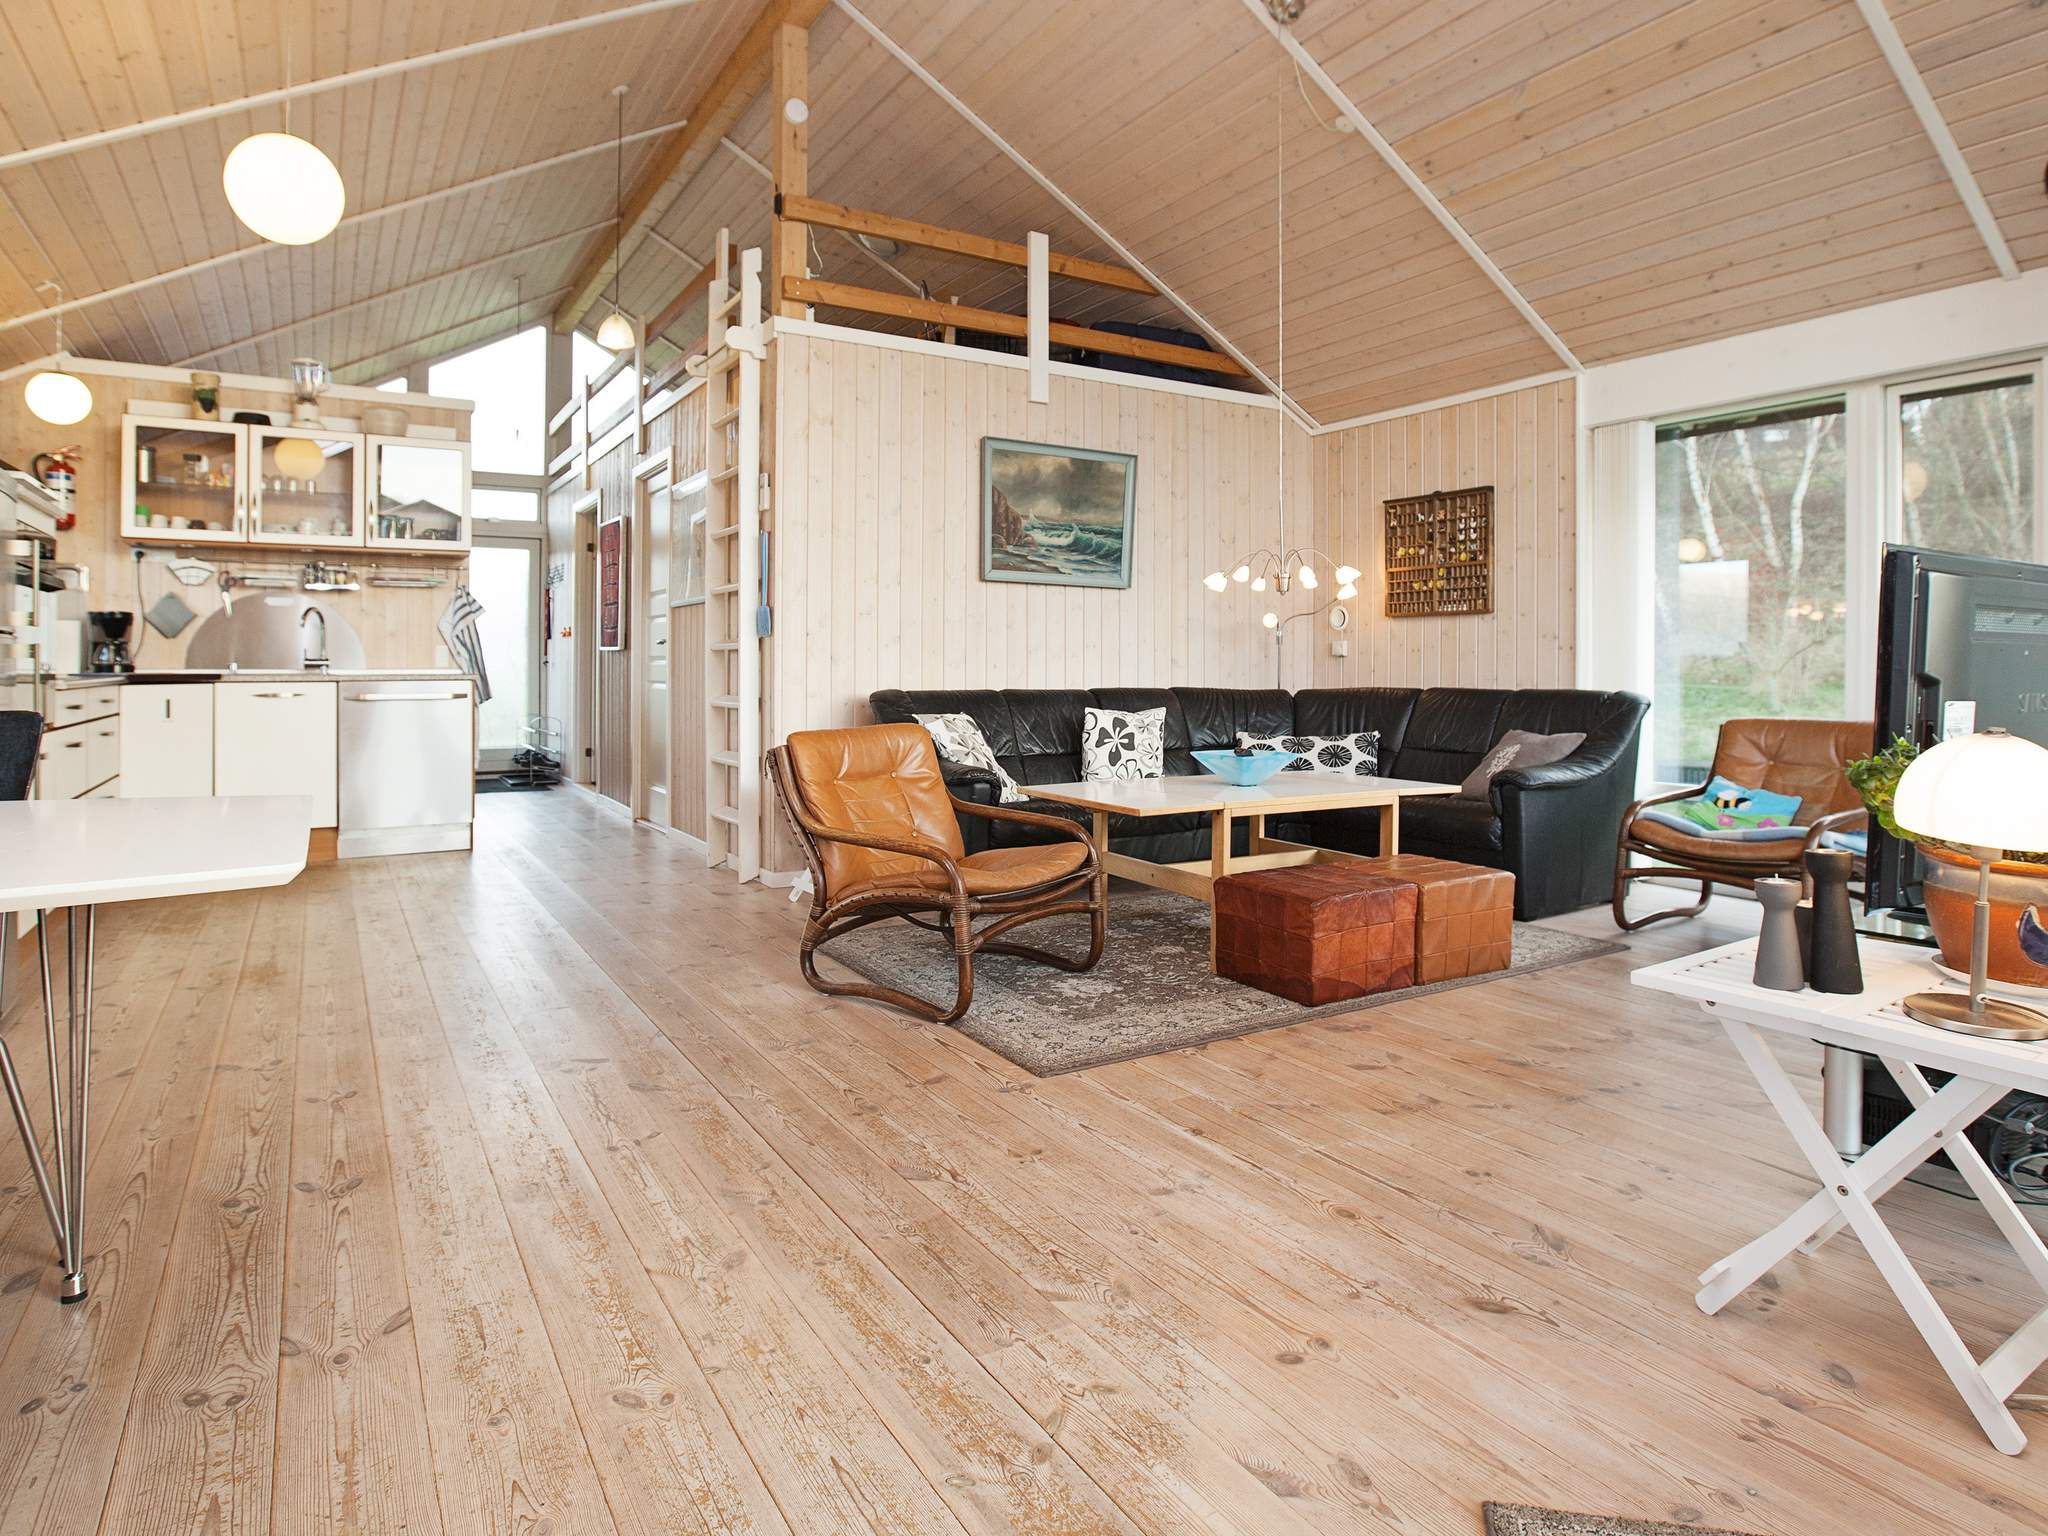 Ferienhaus Røsnæs (488905), Kalundborg, , Westseeland, Dänemark, Bild 8